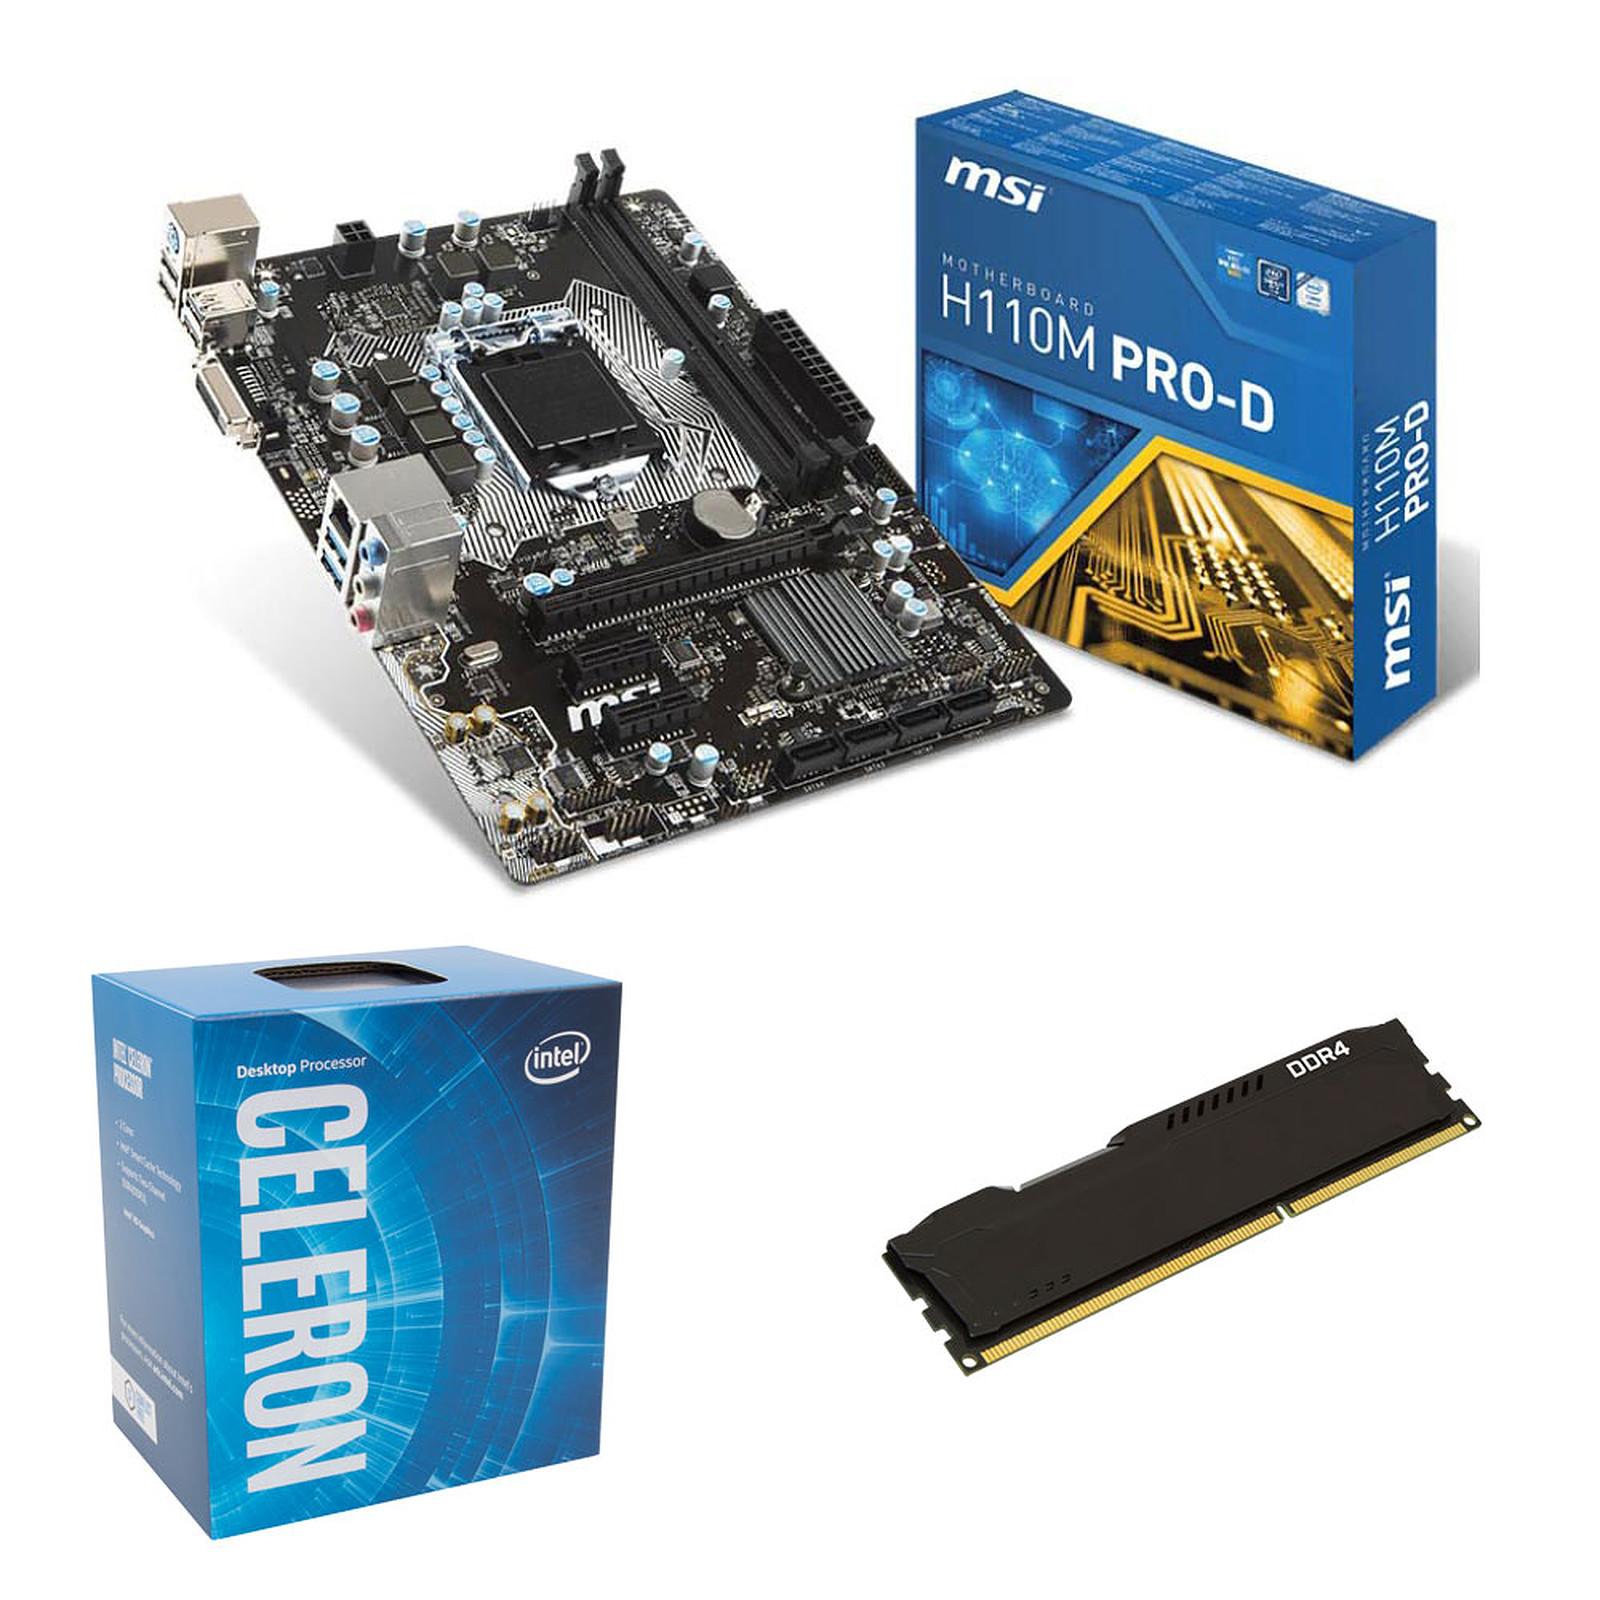 Kit Upgrade PC Celeron G3930 MSI H110M PRO-D 4 Go